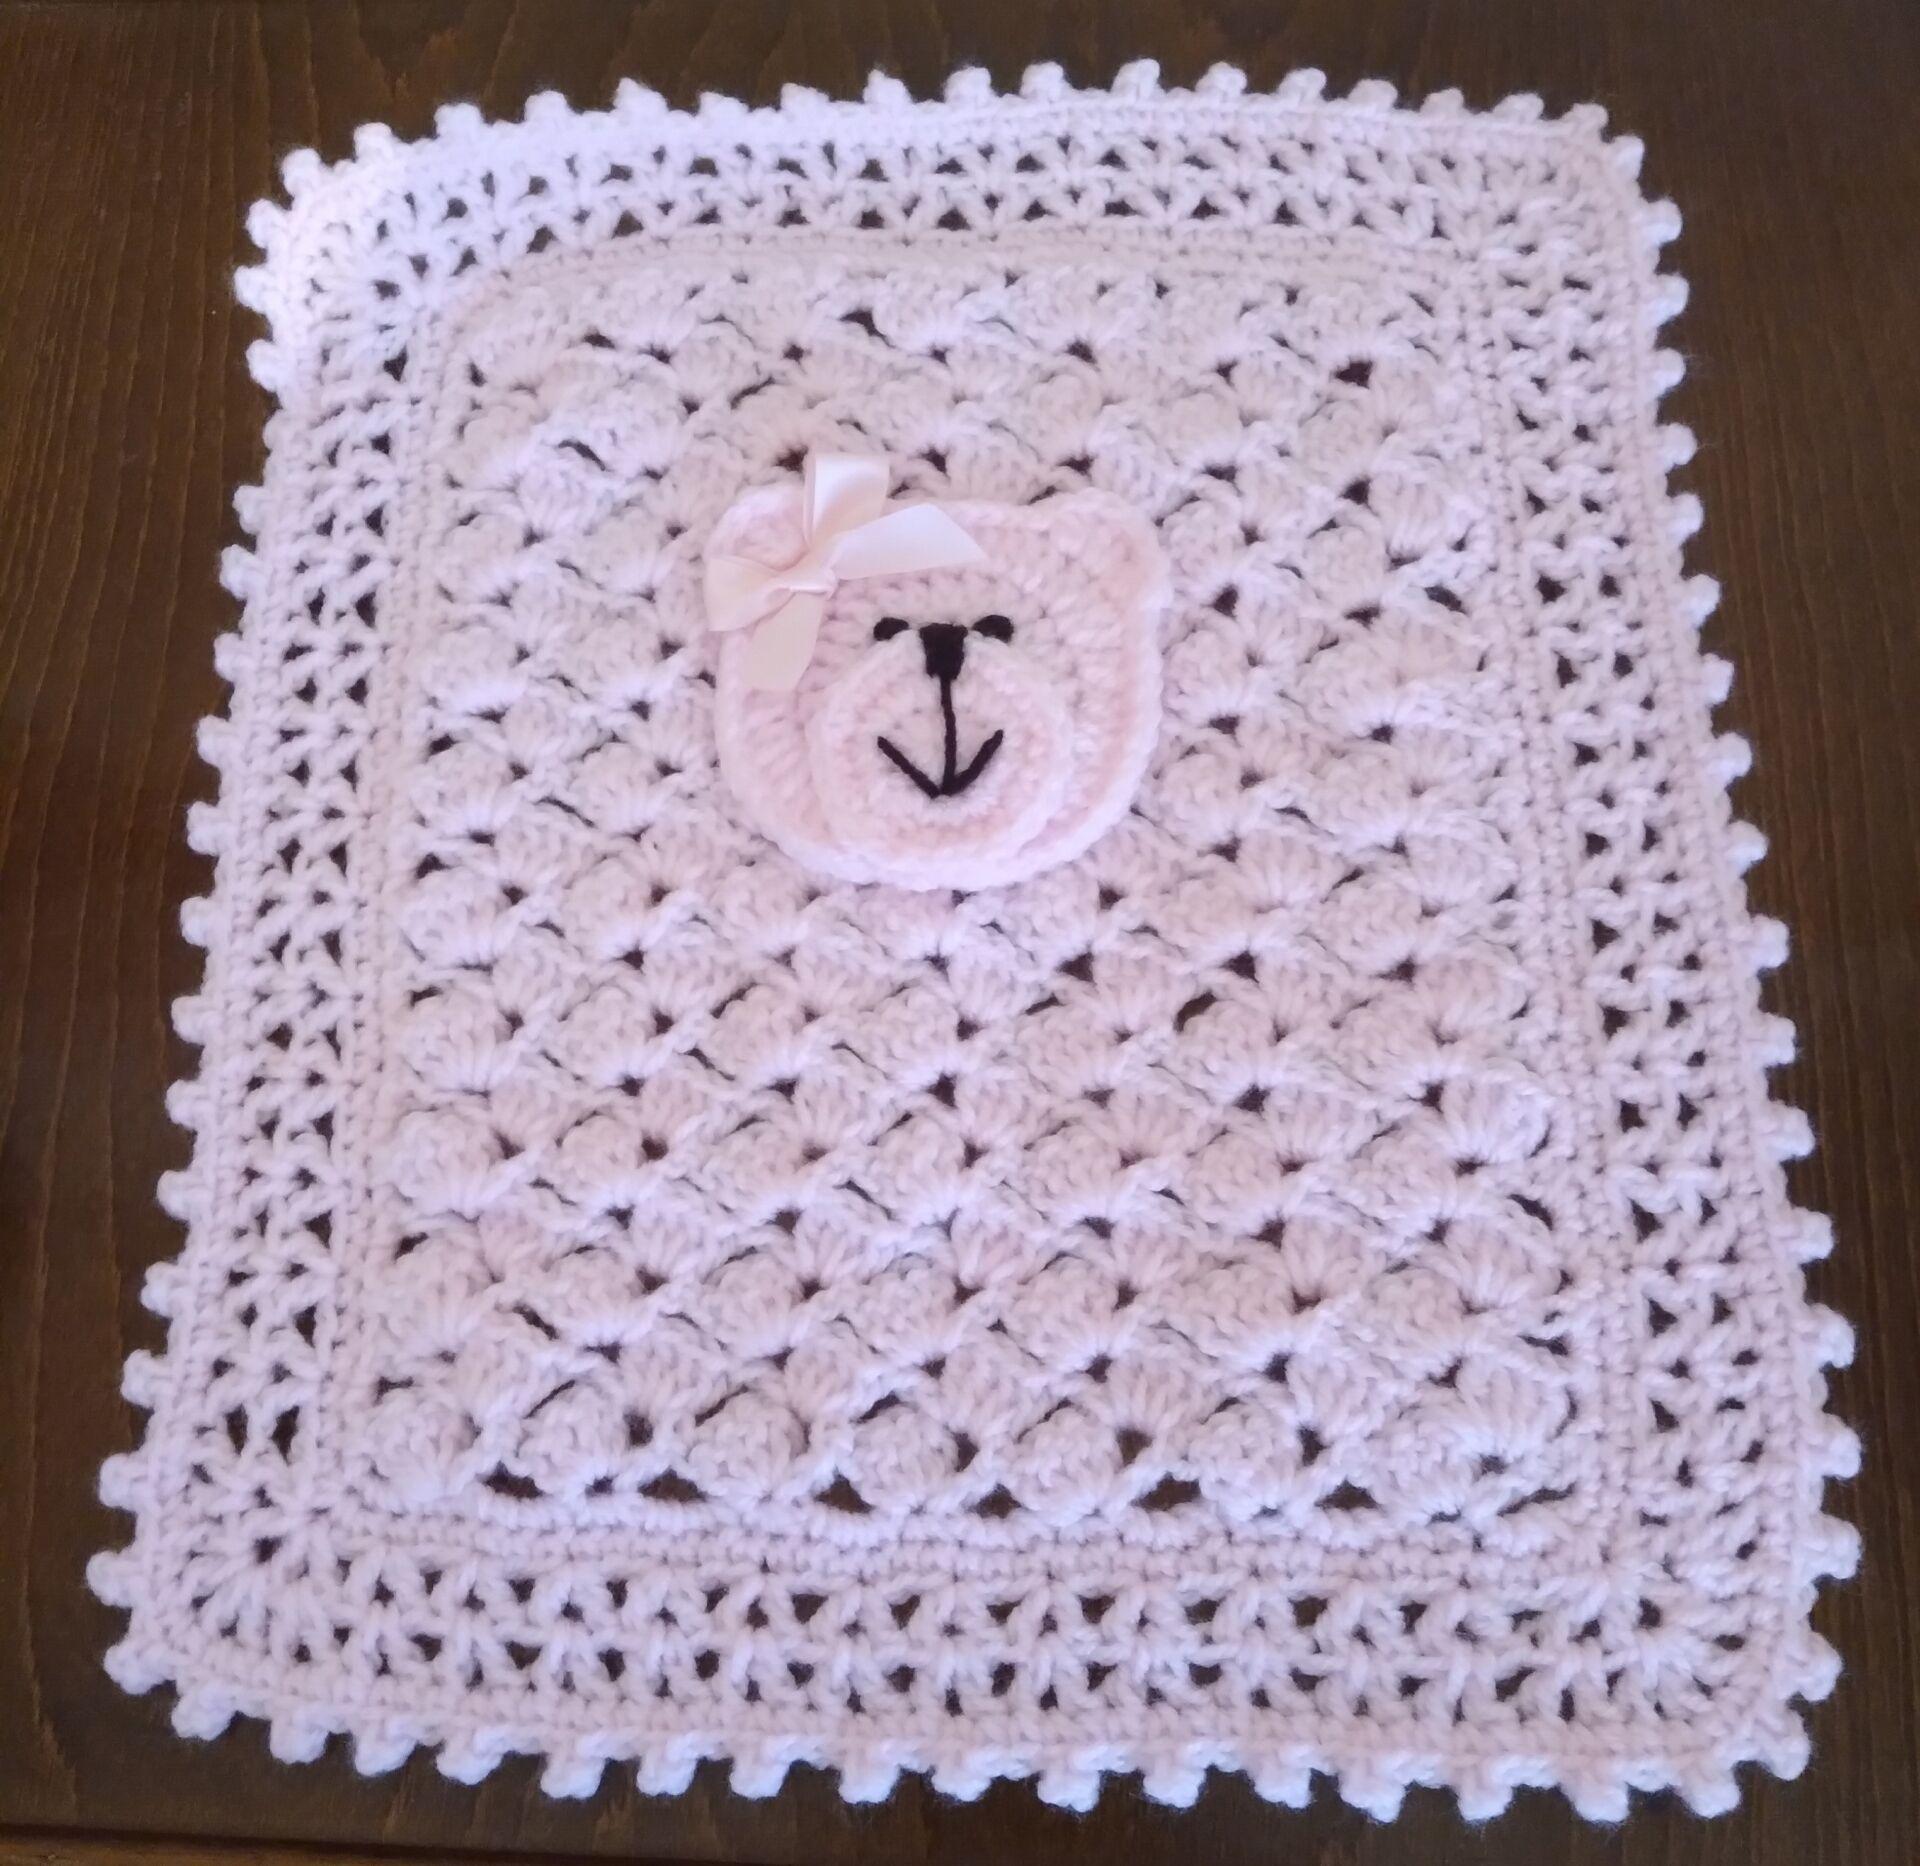 baby blankets smallest crochet burial blanket born at 26 weeks TEDDYLOVE